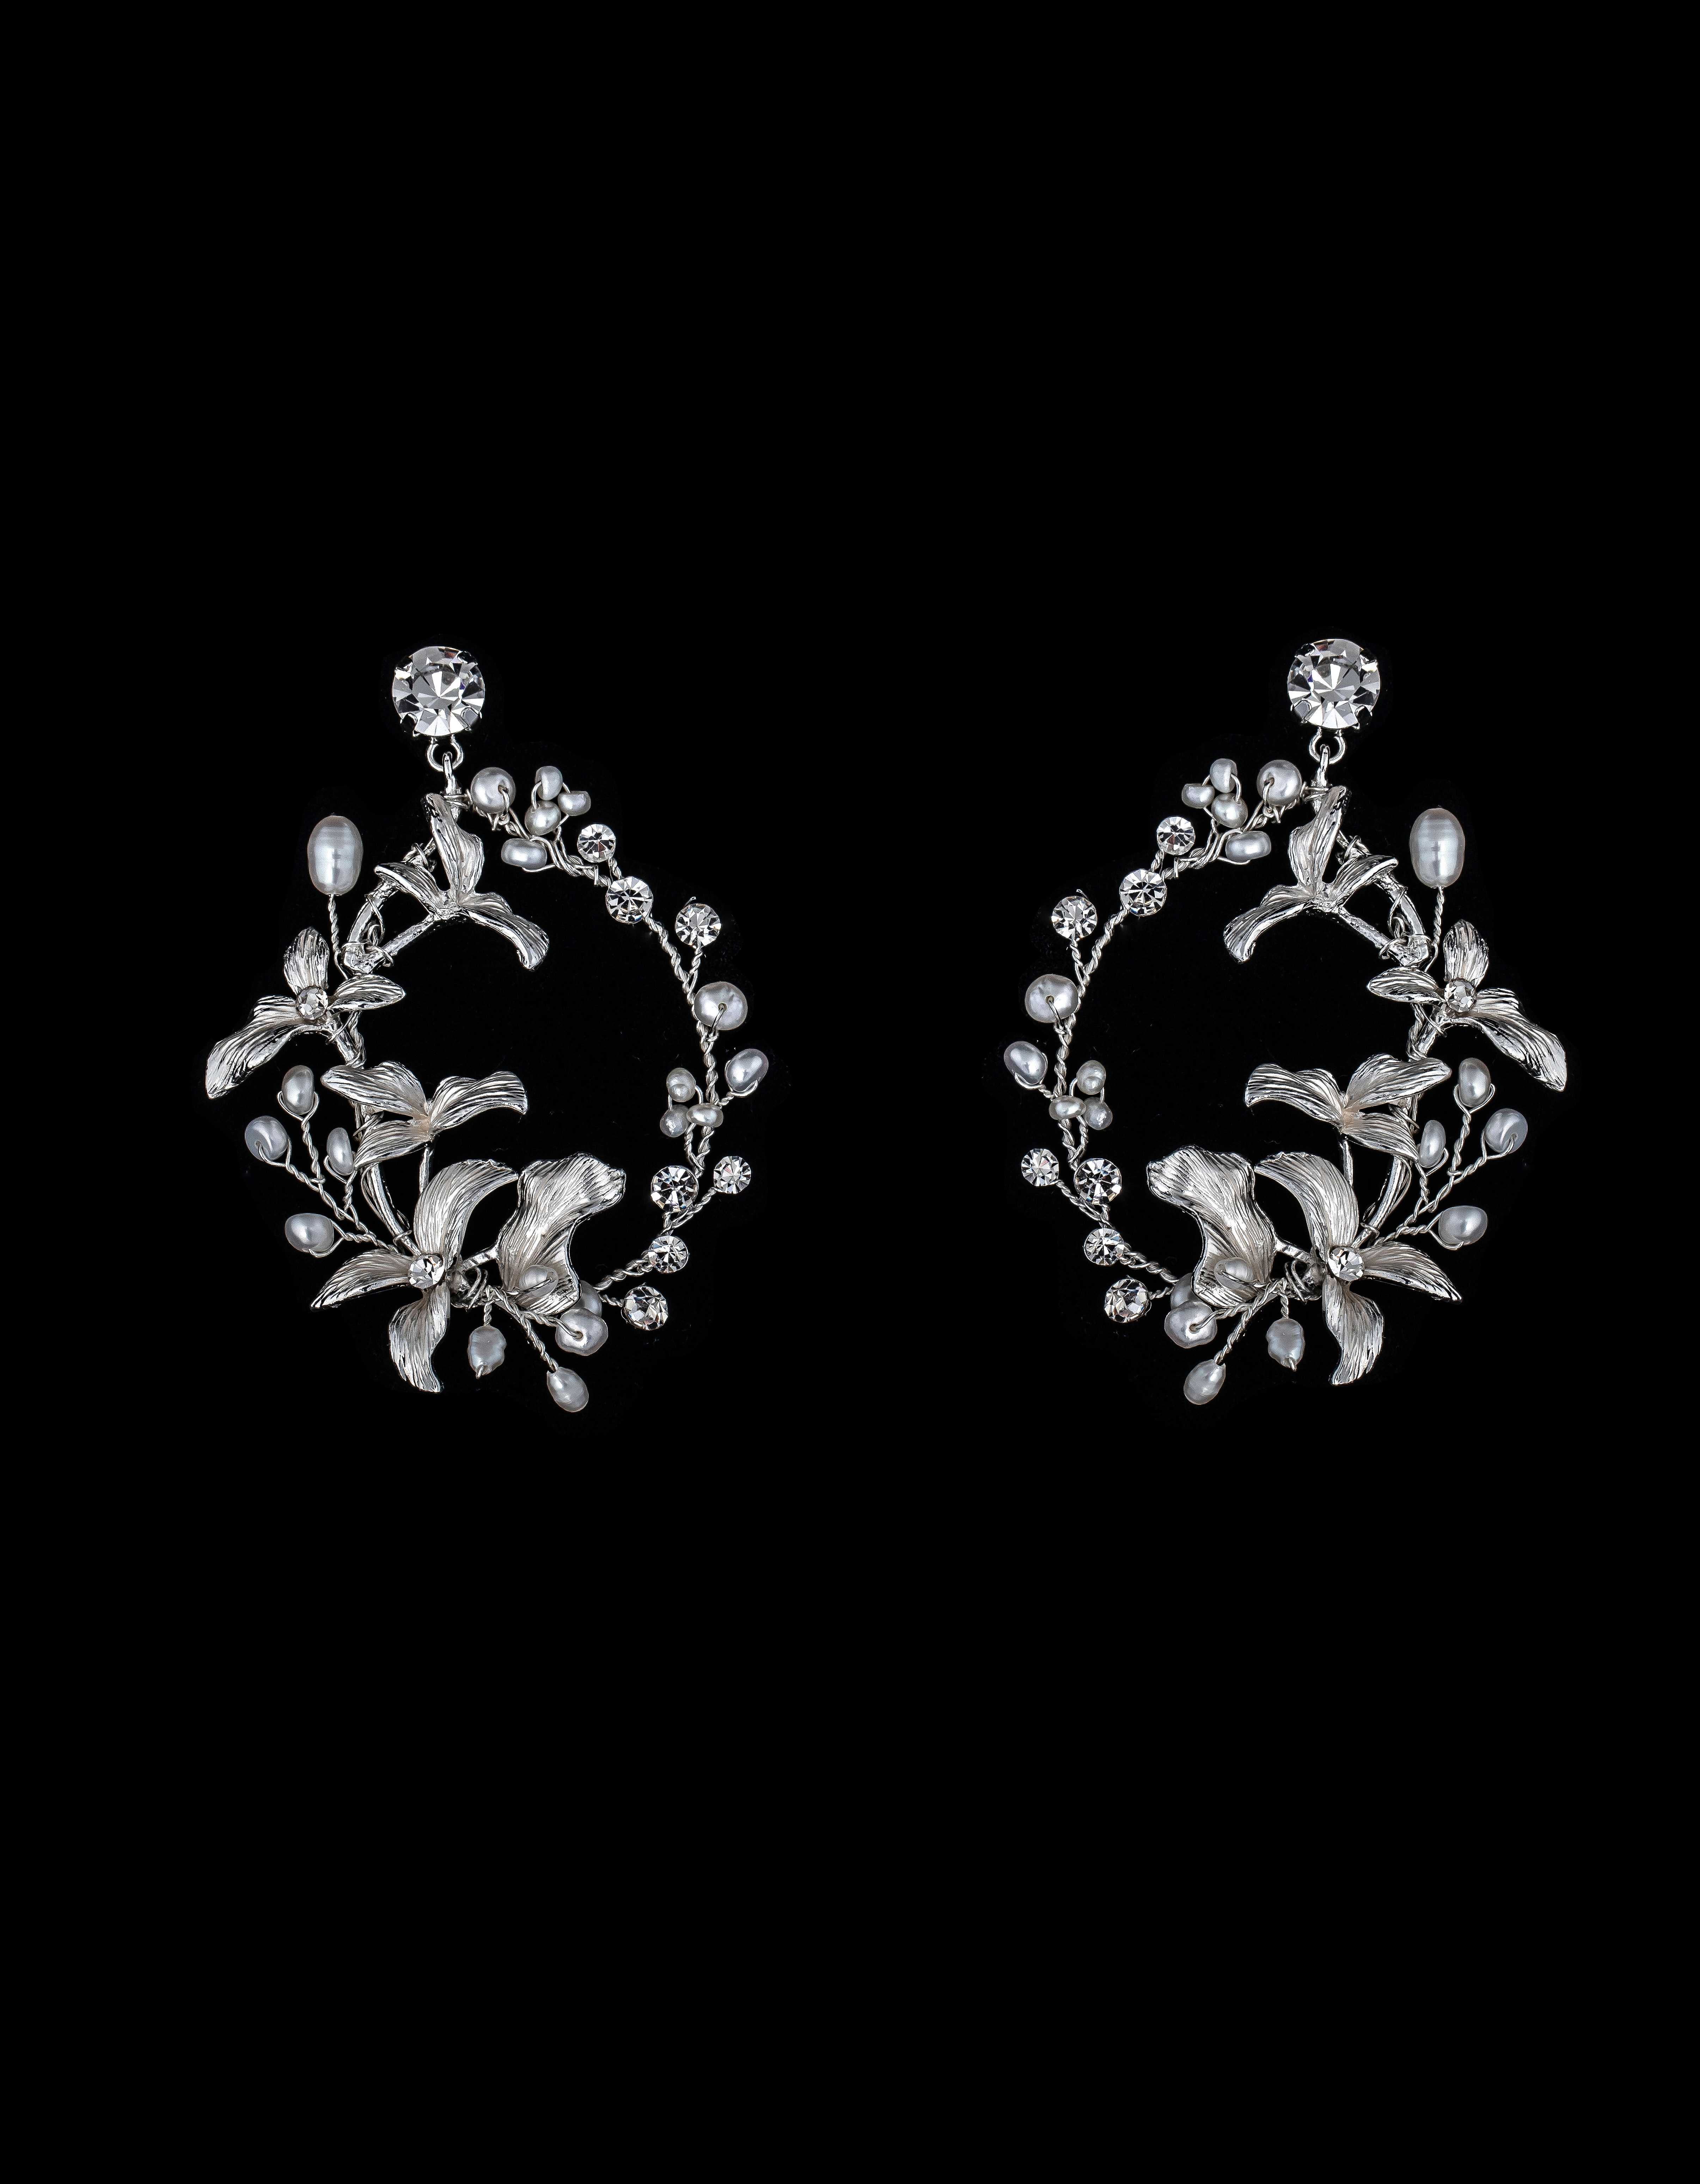 Bridal Classics Earrings MJ-328